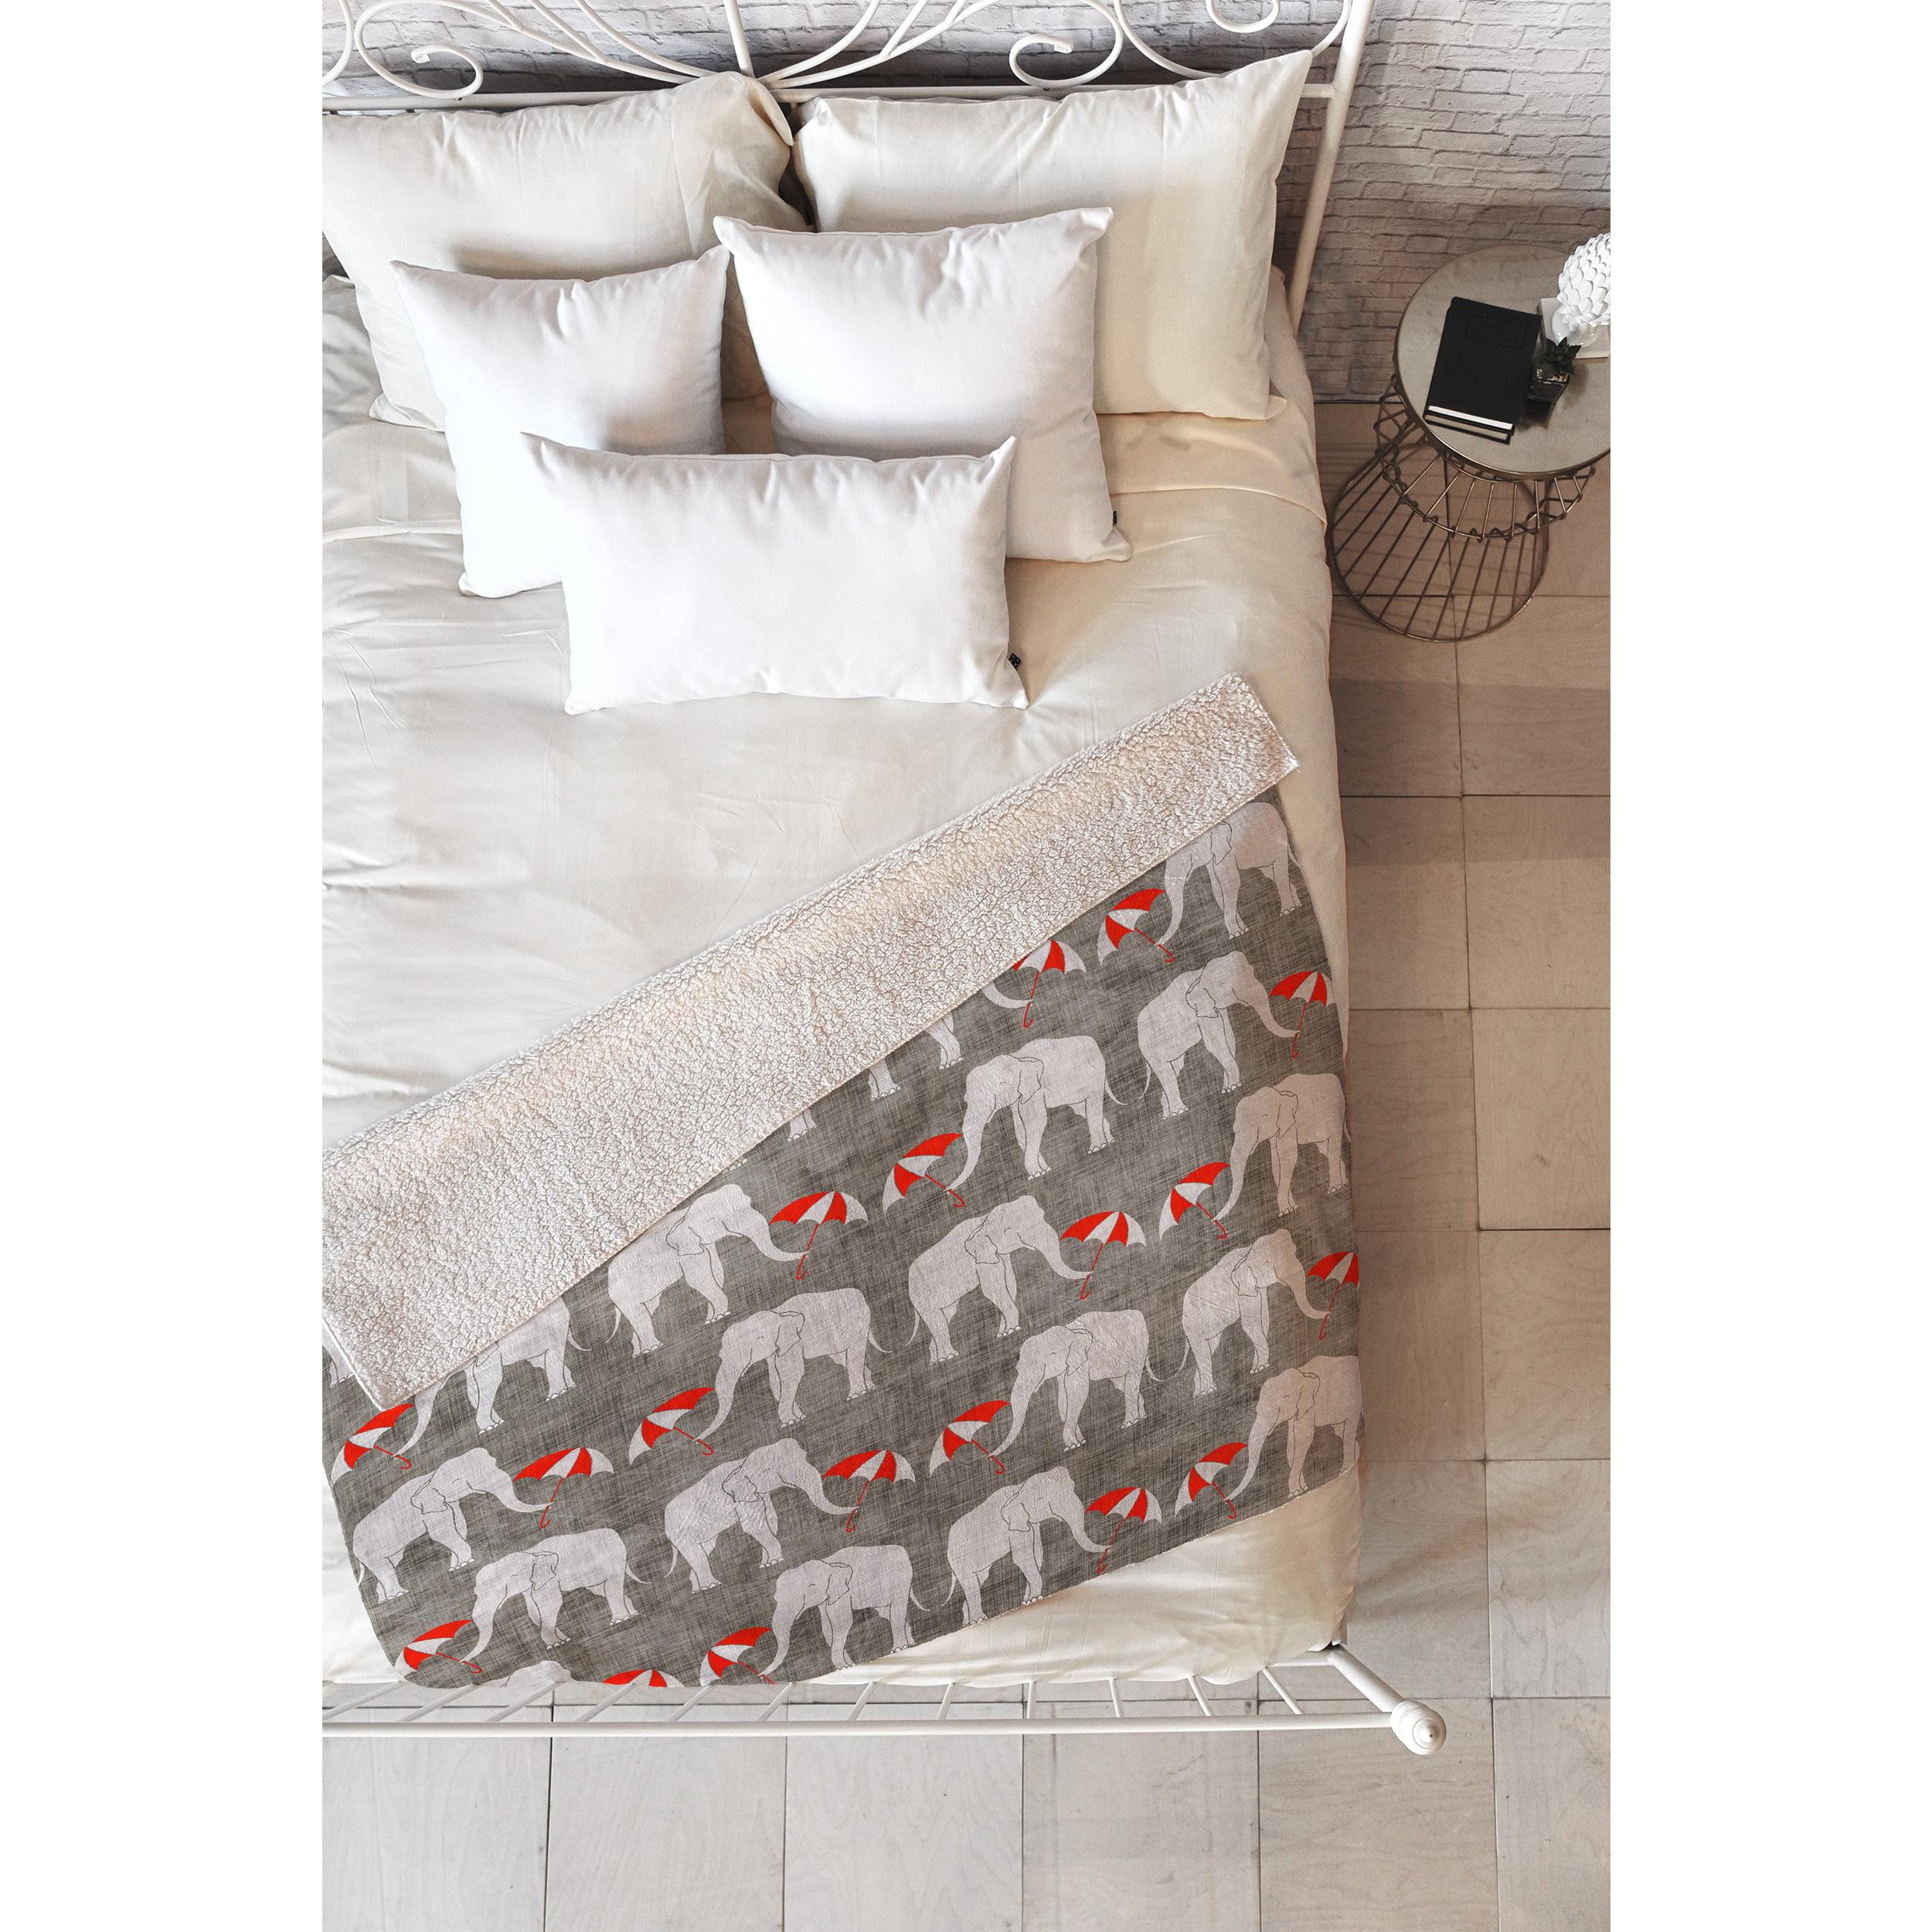 DENY Designs Holli Zollinger Elephant and Umbrella Red Fleece Throw